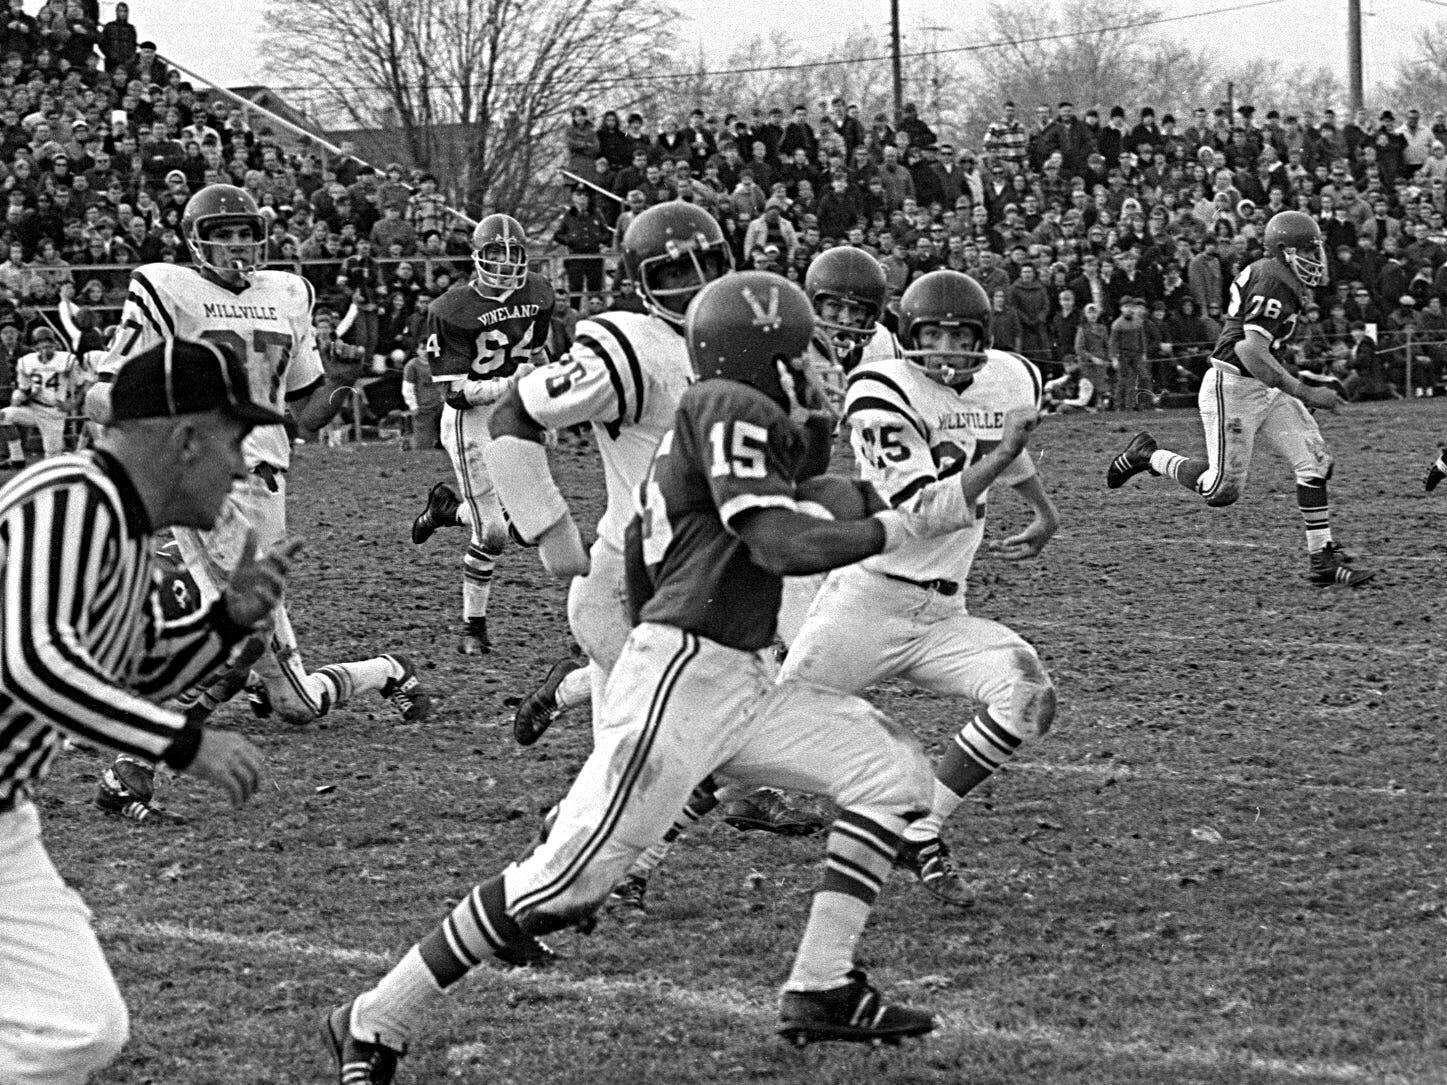 Football: Vineland vs. Millville 1969